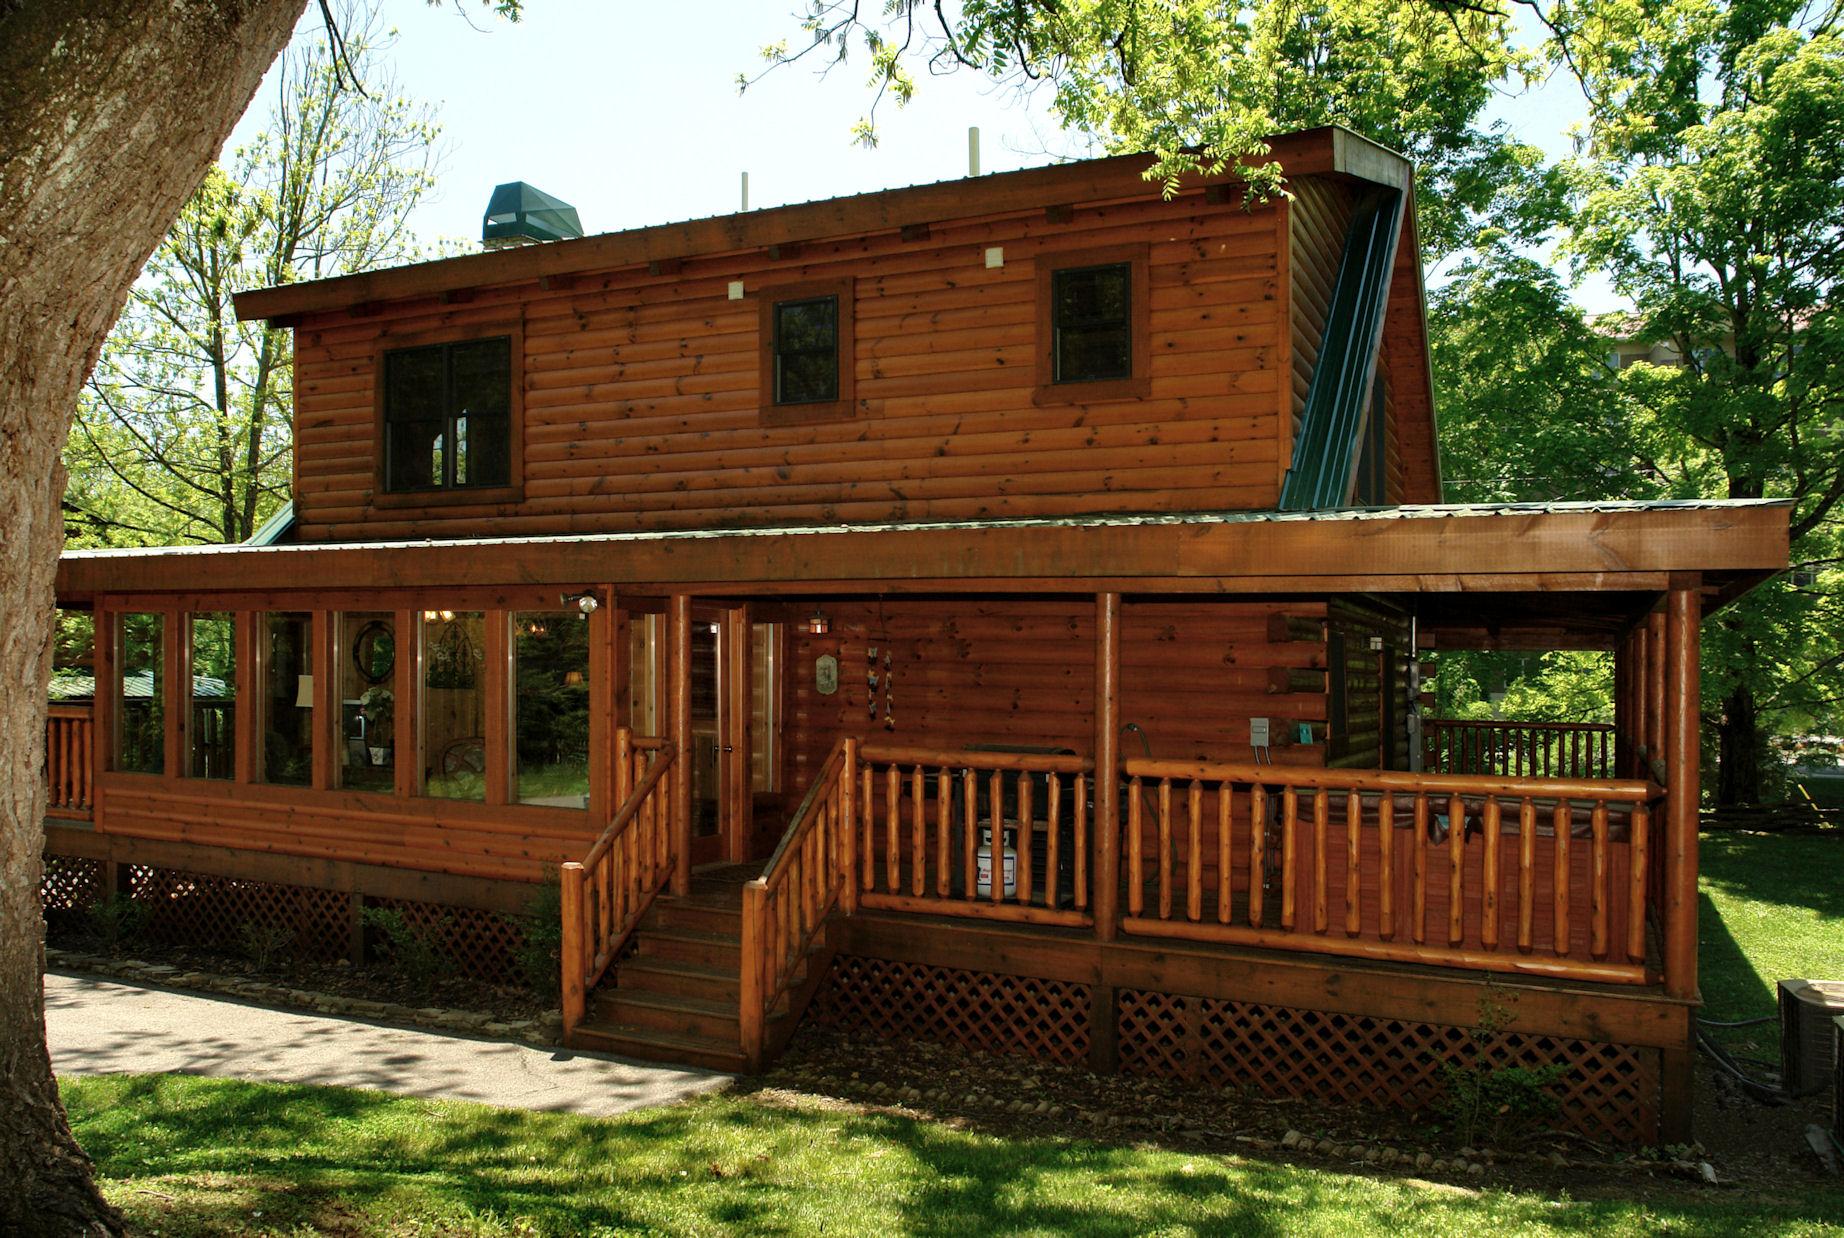 3 Bedroom Cabin Rentals In Pigeon Forge Tn 28 Images 3 Bedroom Cabin Near Downtown Pigeon